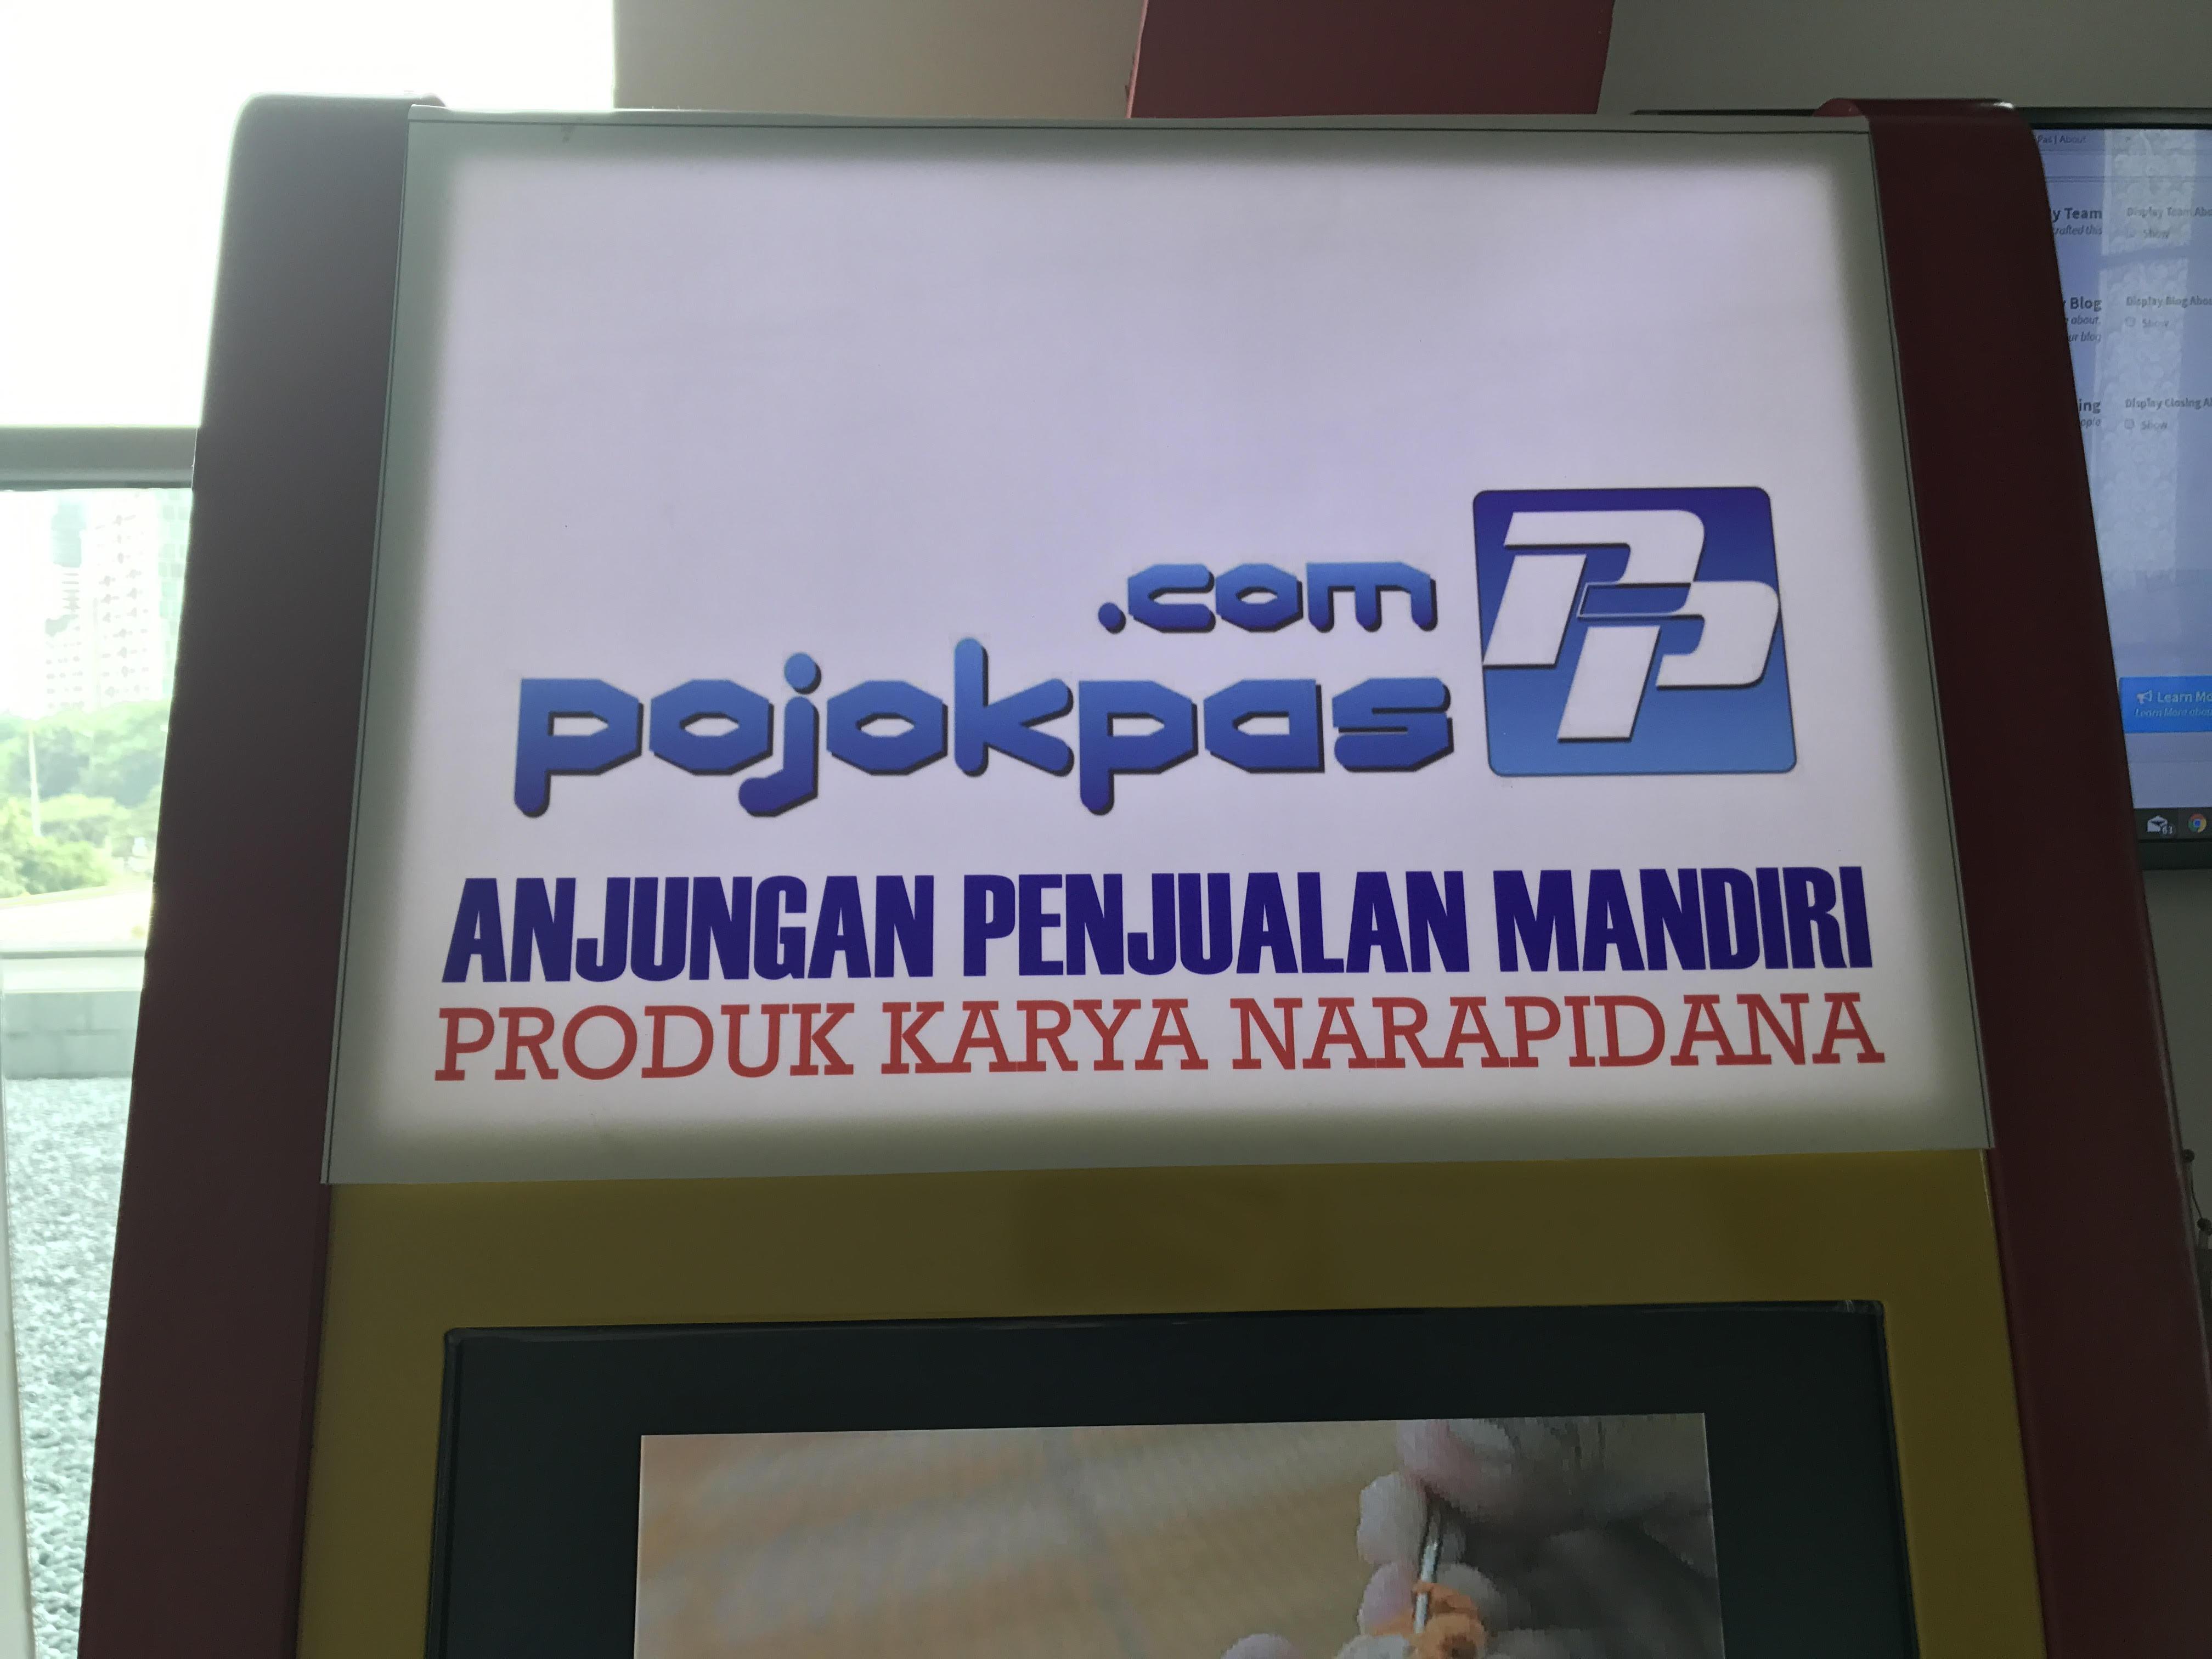 Narapidana Jual Produk Karya di Pojokpas.com